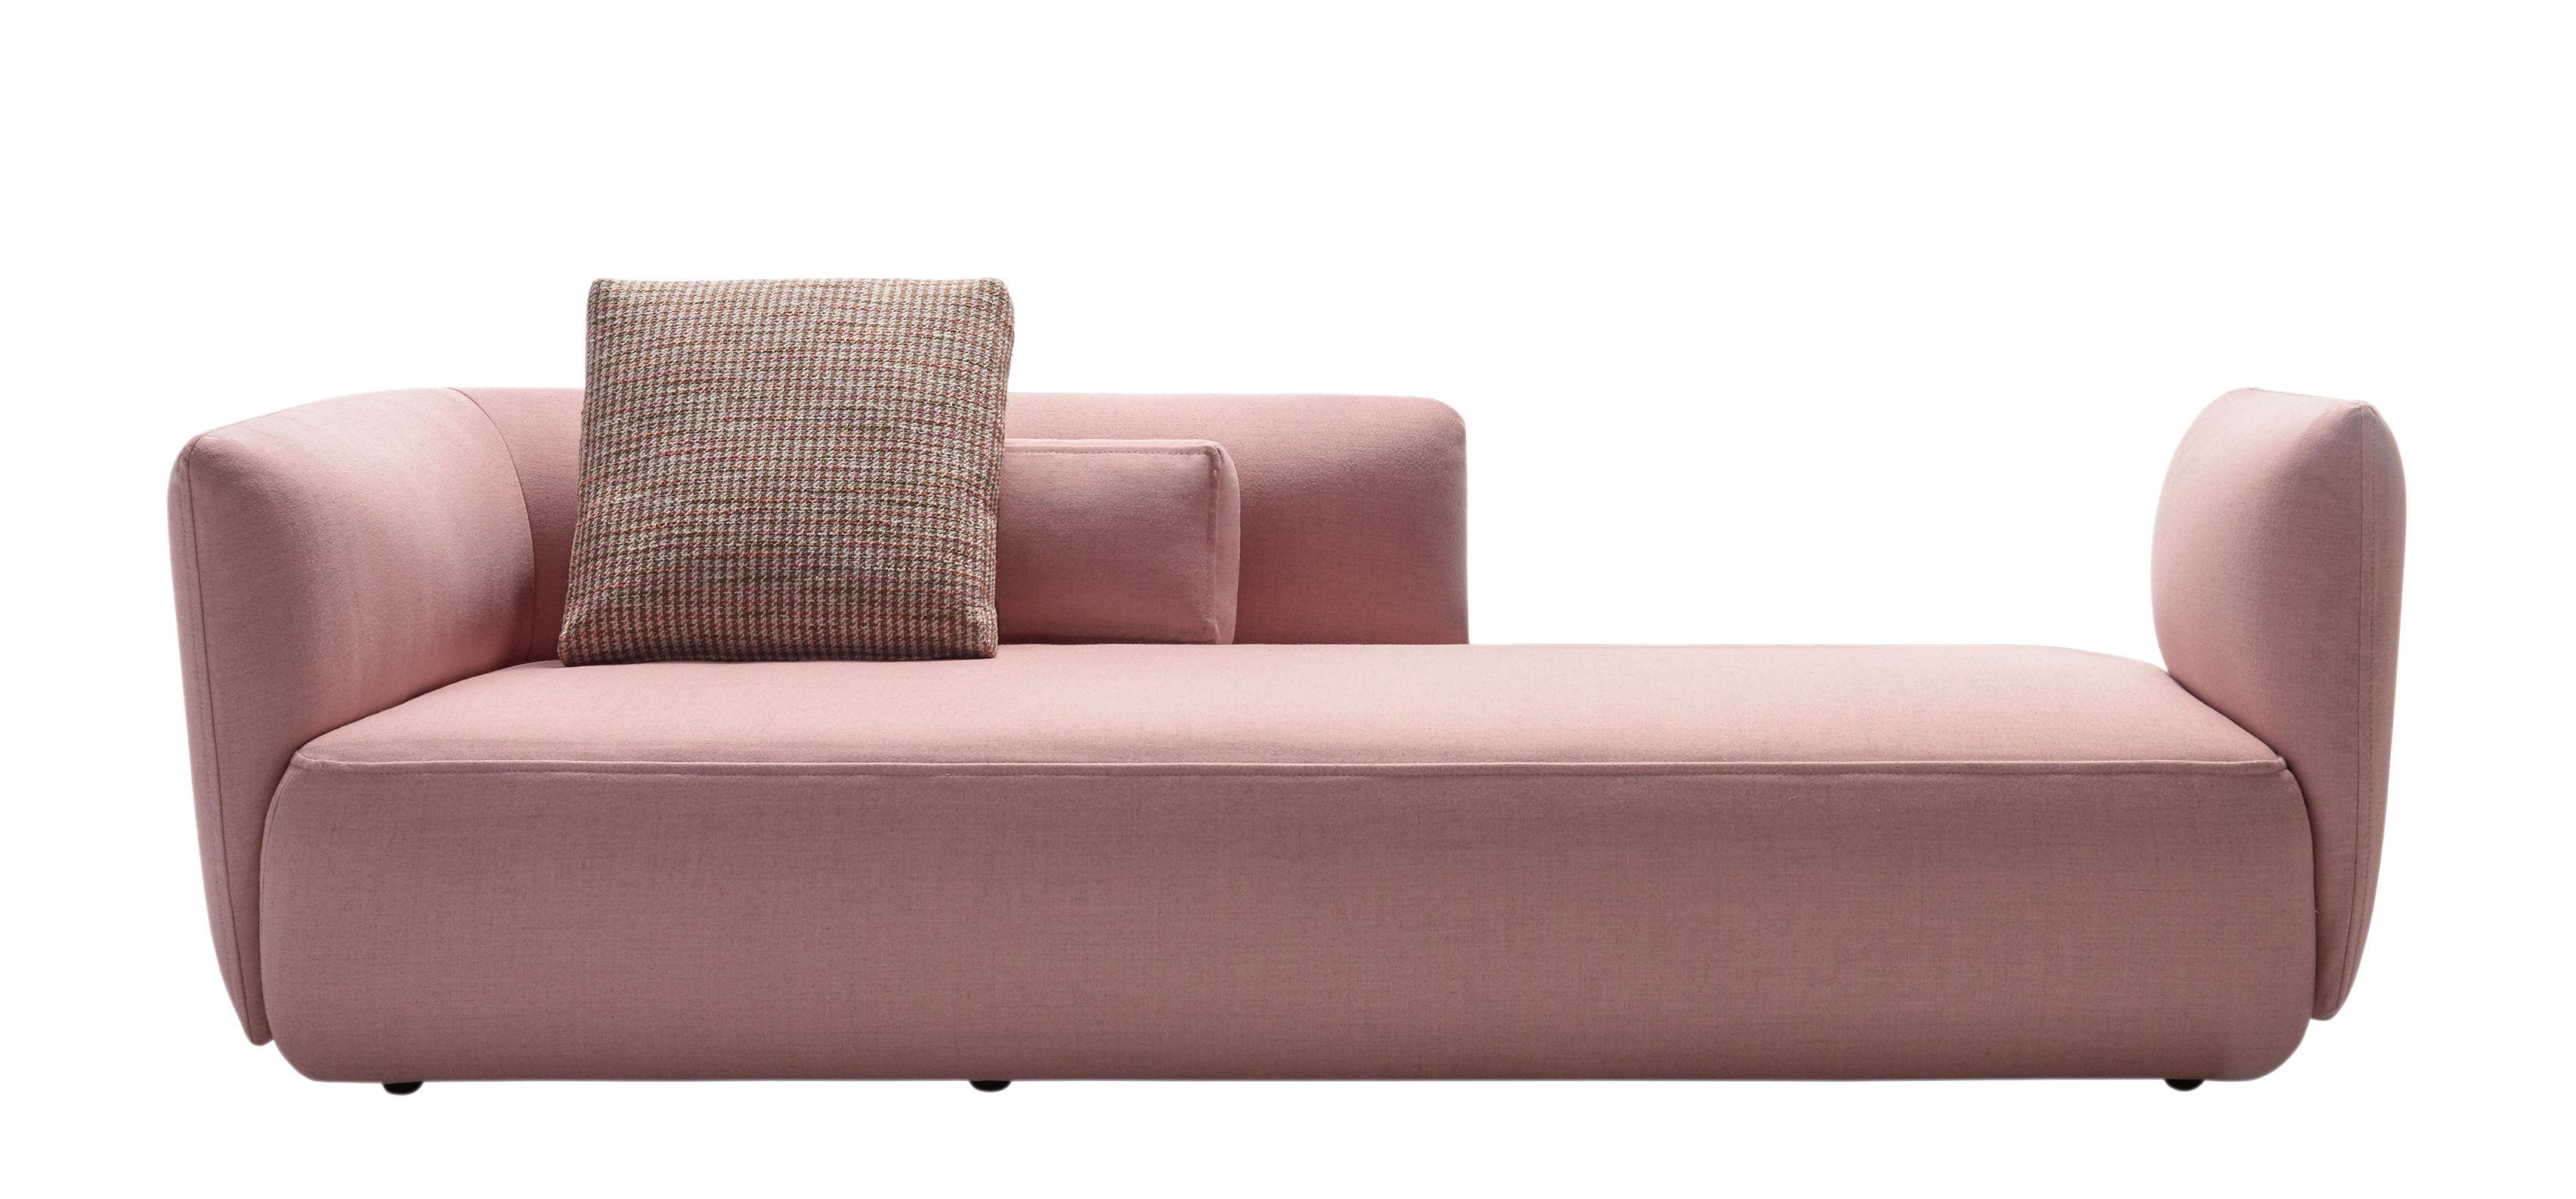 canap droit cosy paolina 3 places l 230 cm canap. Black Bedroom Furniture Sets. Home Design Ideas